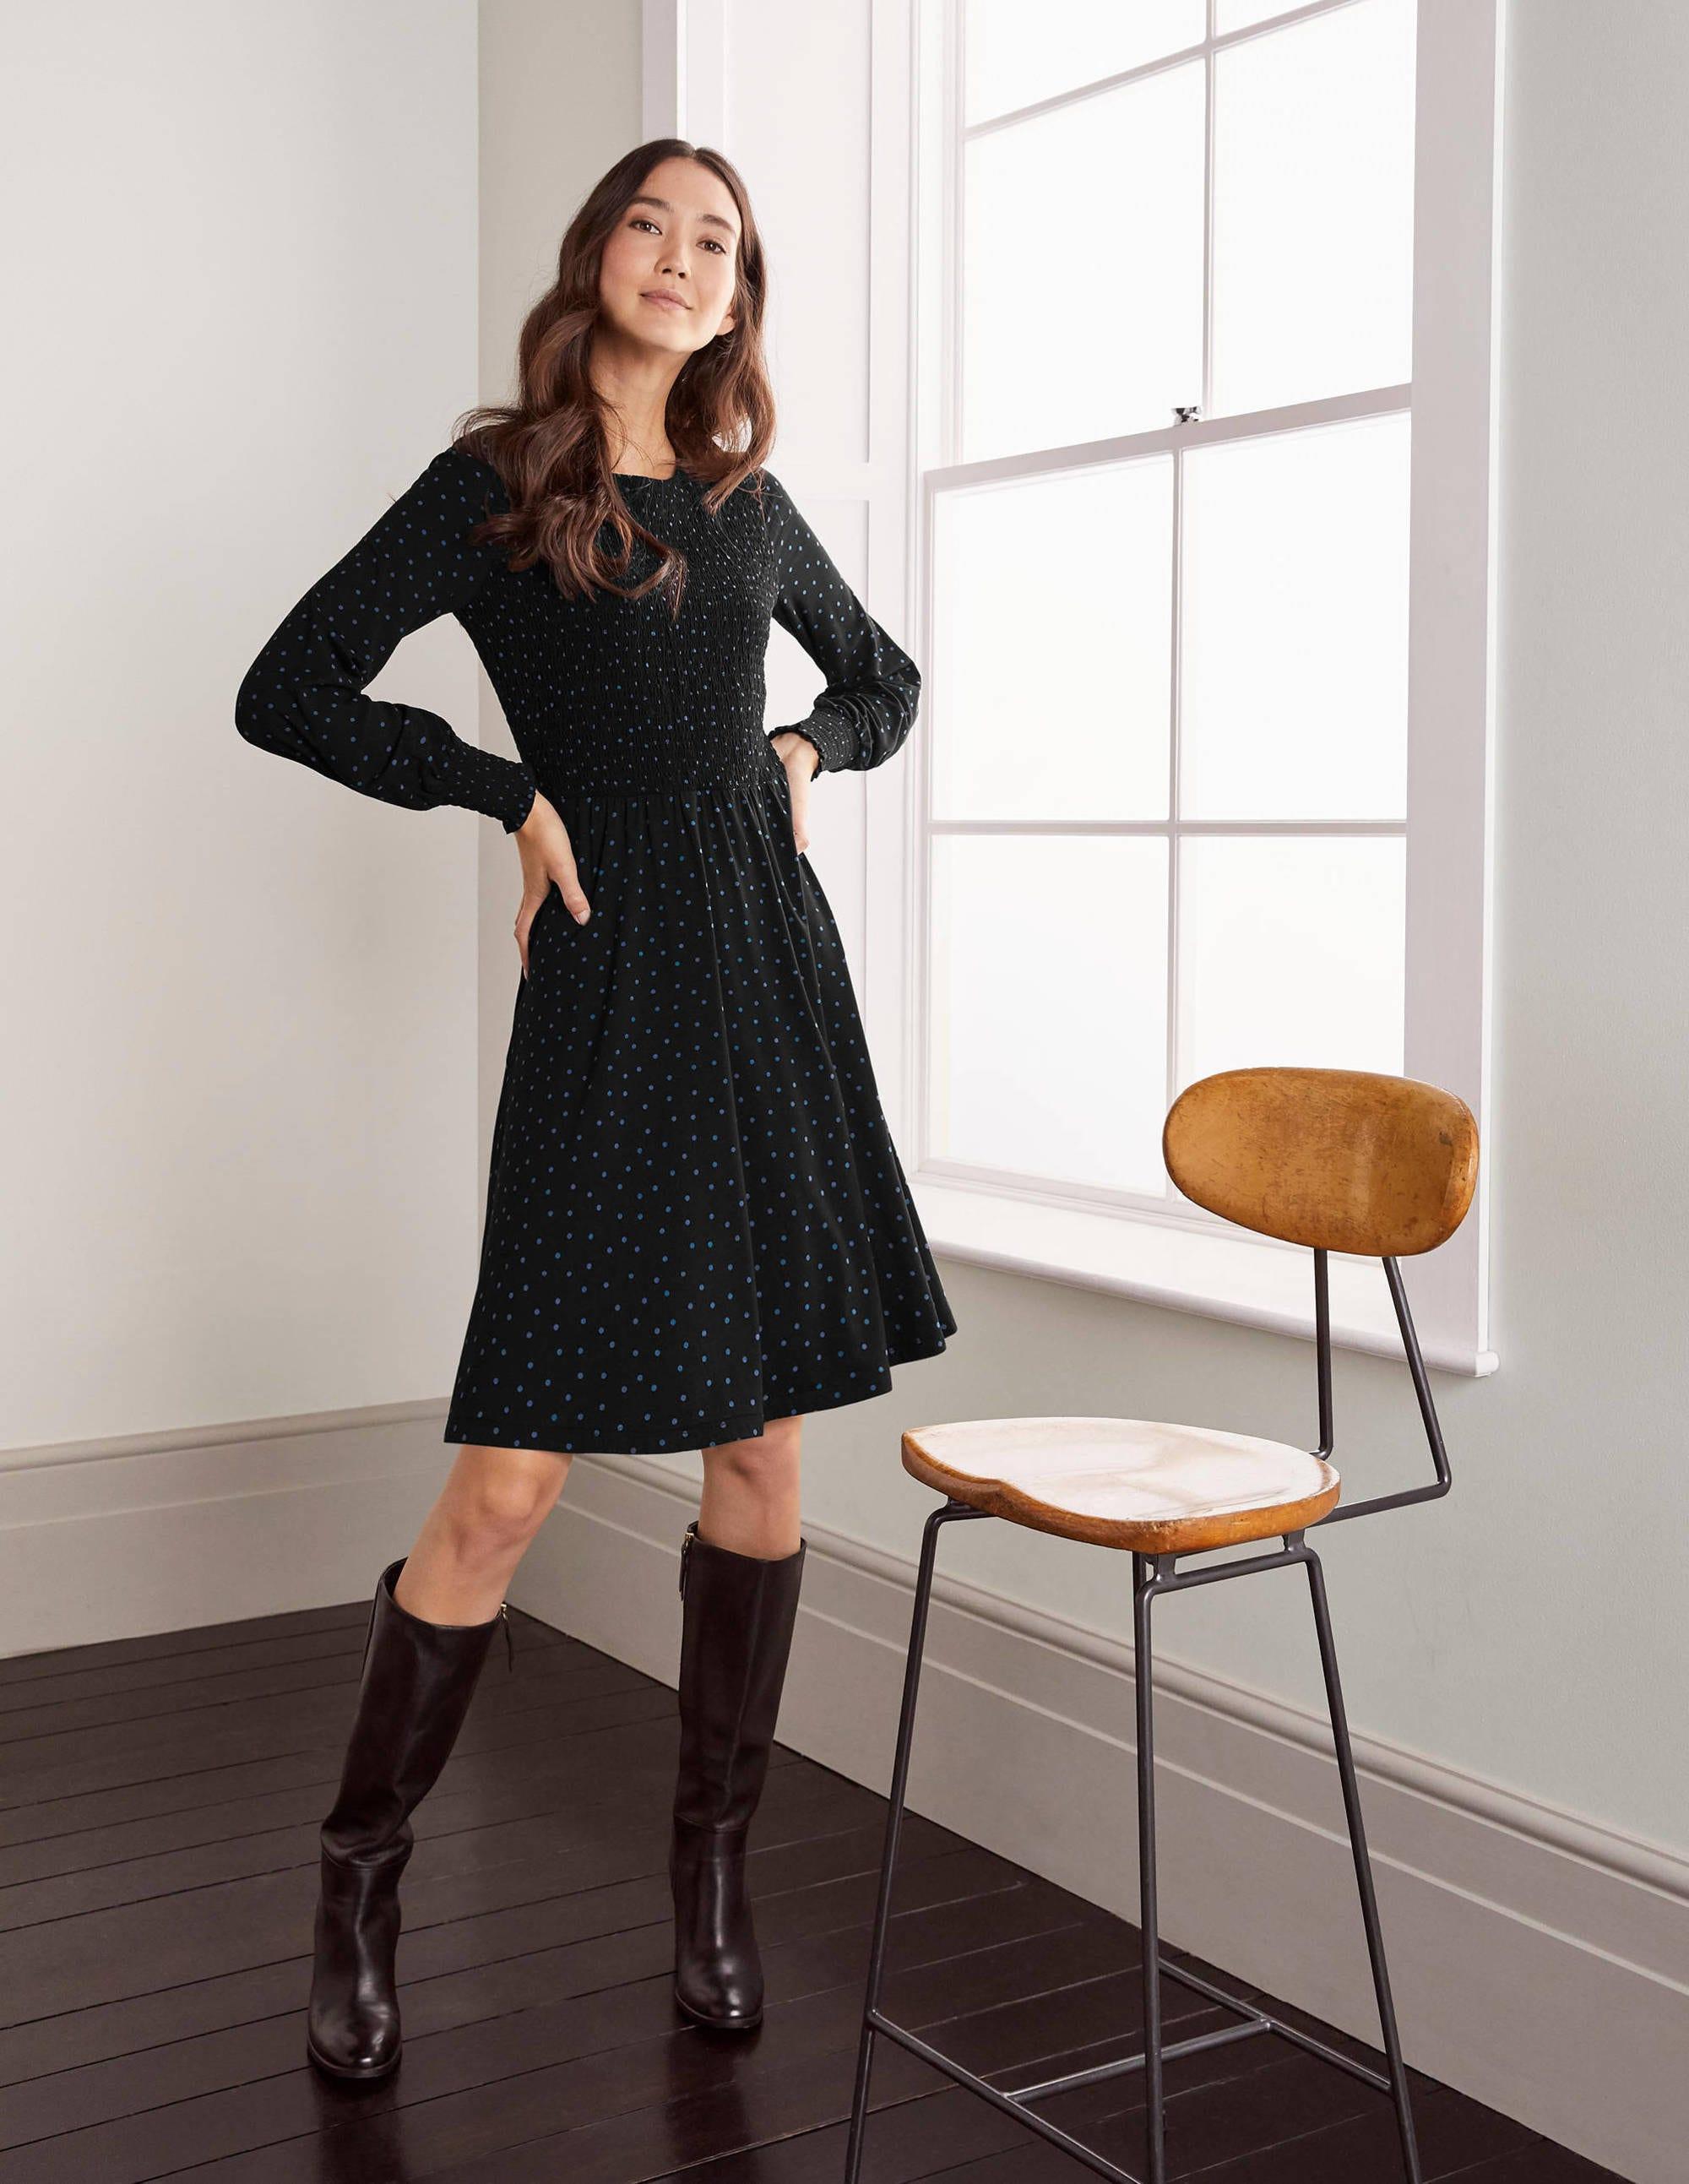 Boden Lena Smocked Jersey Dress - Black/Drake, Polka Dot